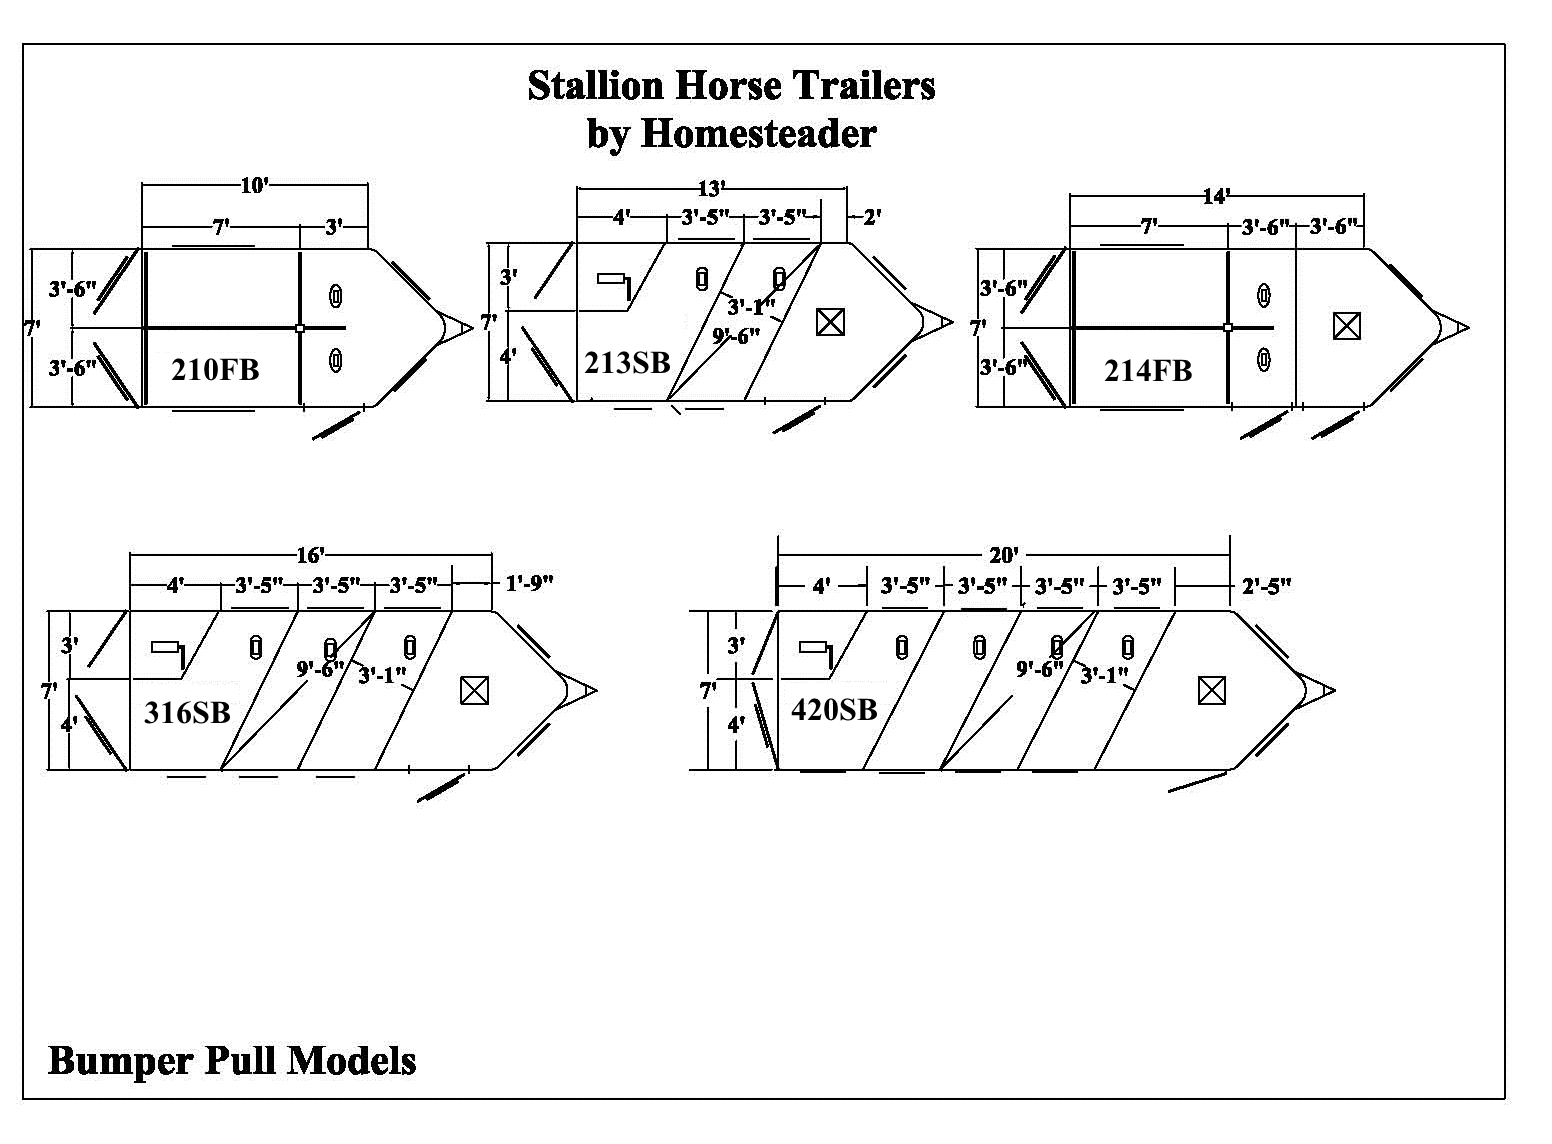 Stallion Horse Trailers | Homesteader Trailers